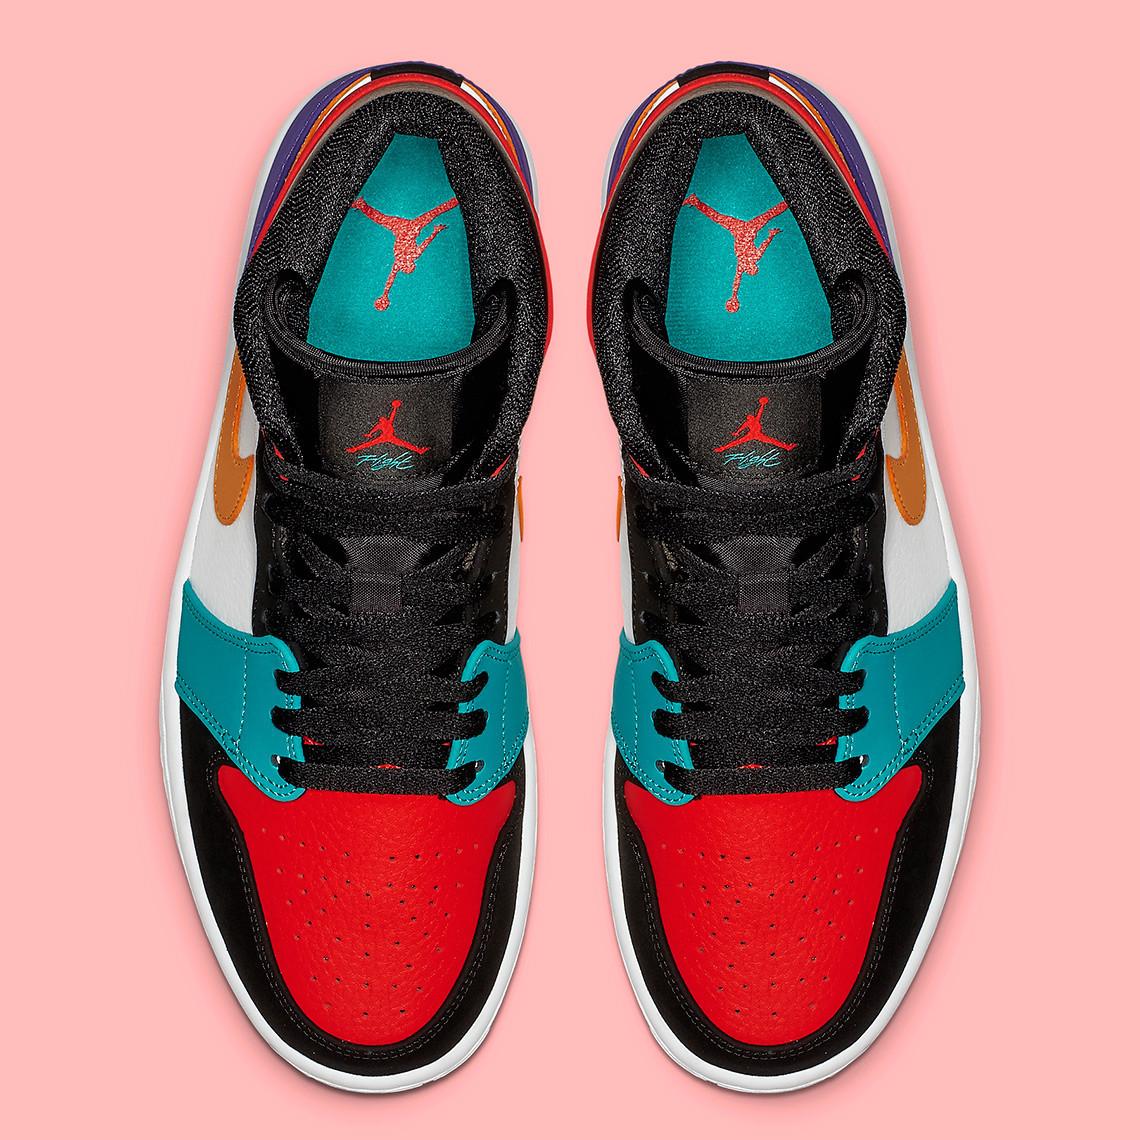 30.5cm /us12.5/ Footpatrol/NIKE AIR JORDAN 1 MID What the NBA Multi Crazy ナイキ ジョーダン マルチ クレイジー TOP3 554724-1_画像4